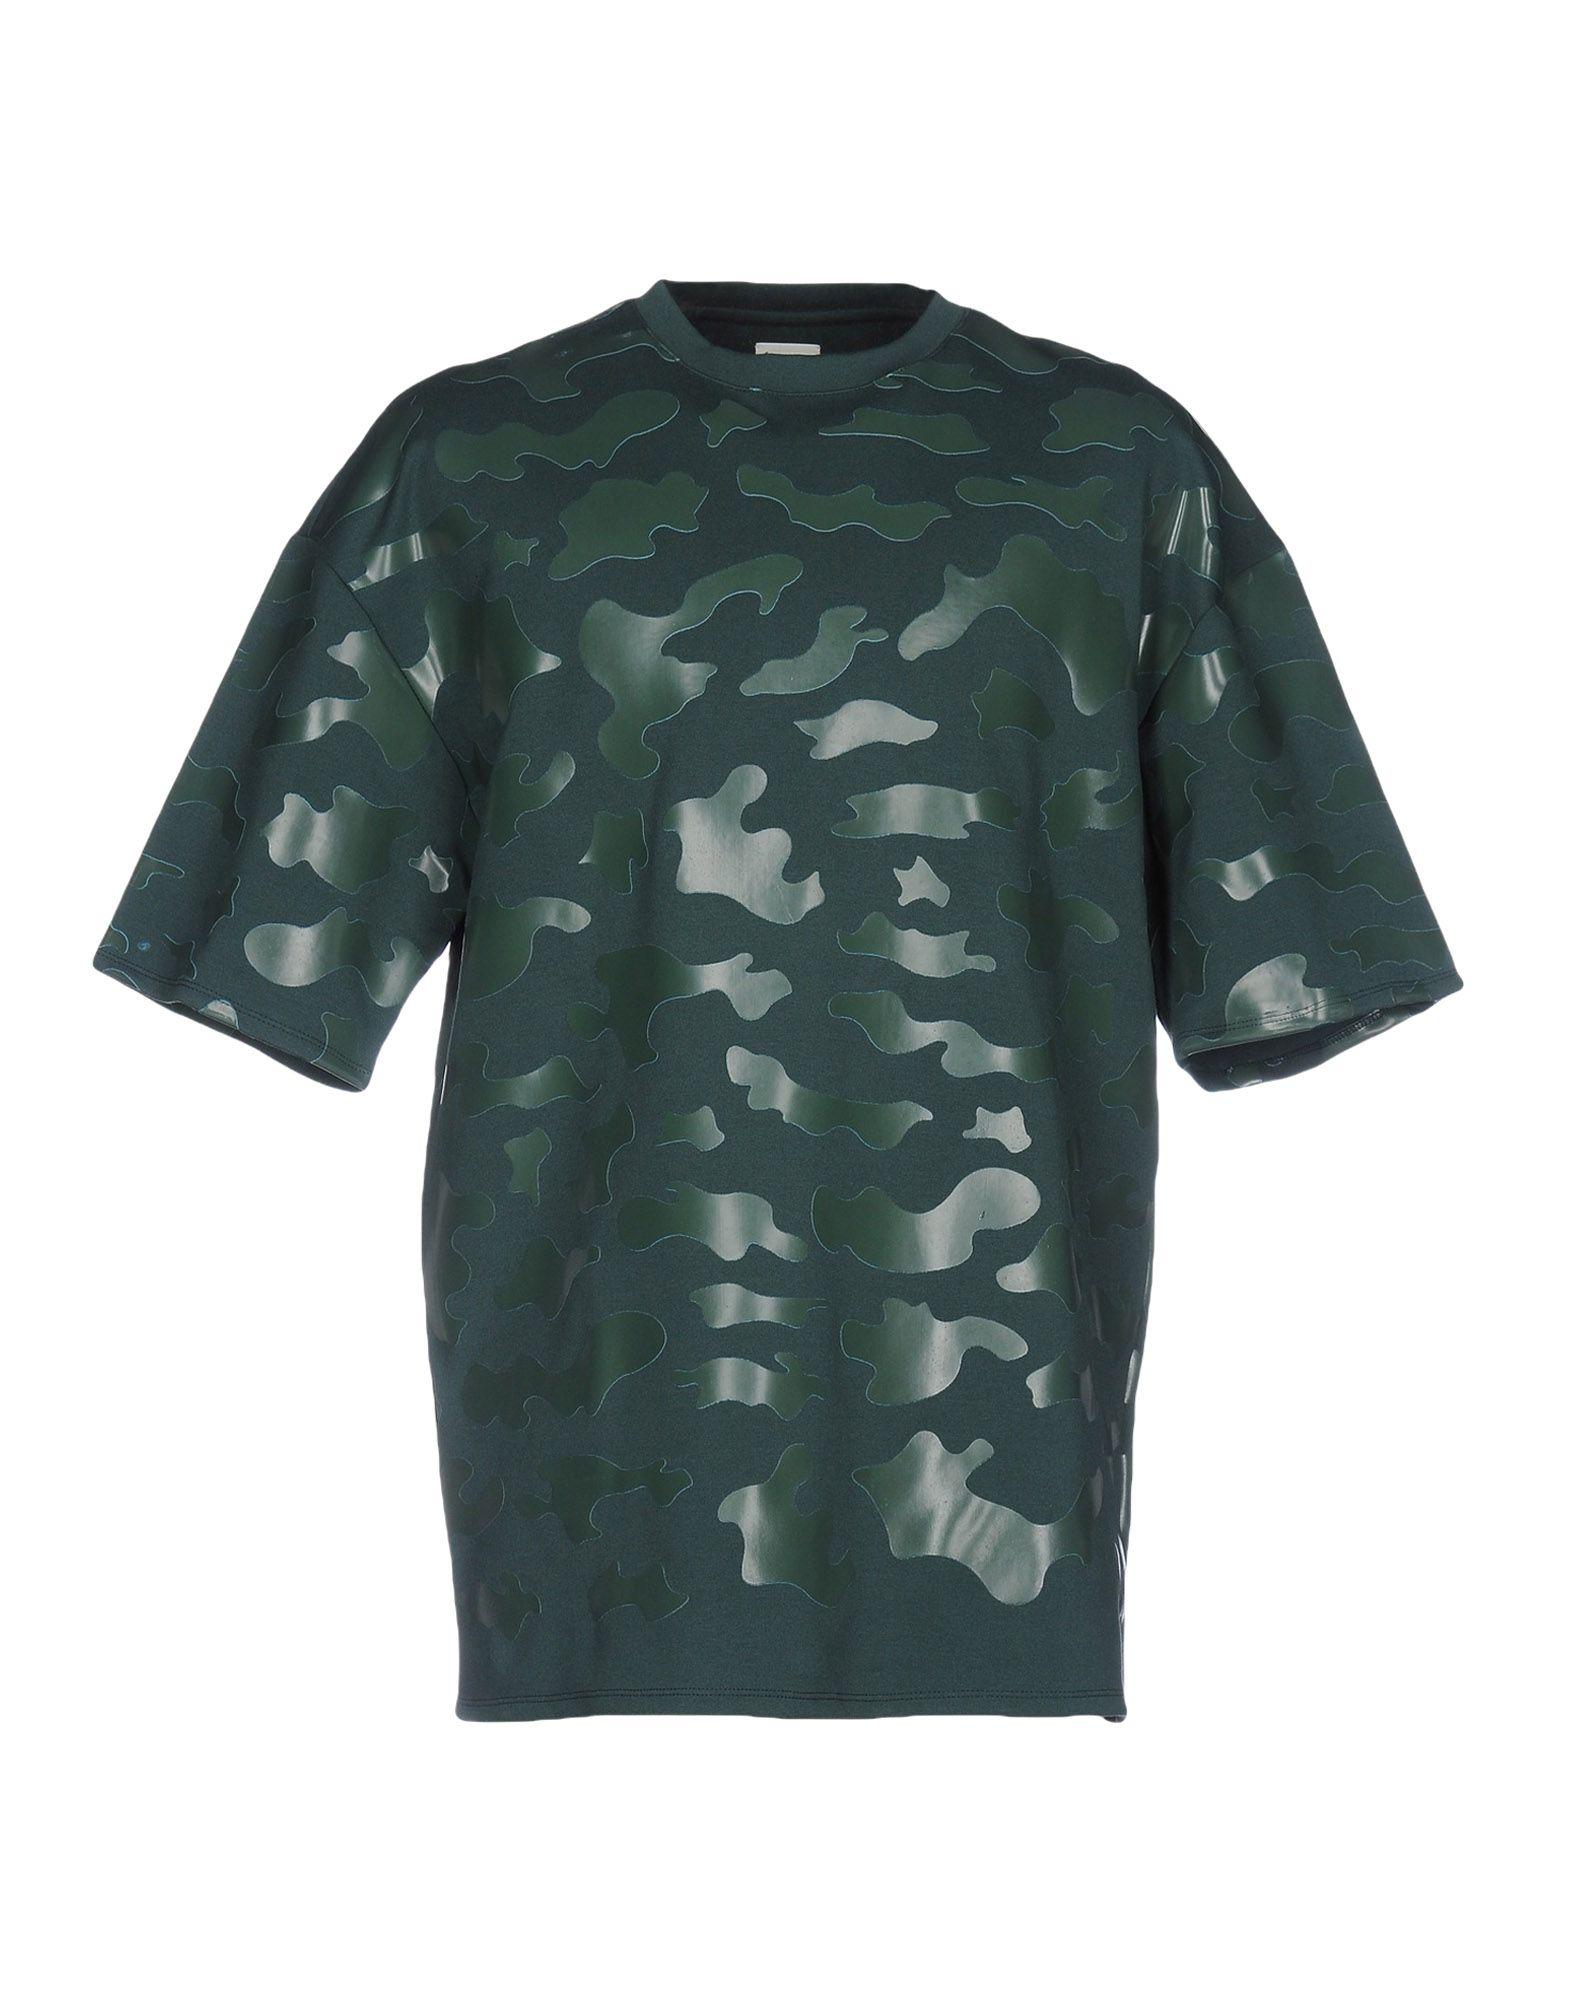 CY CHOI Sweatshirts in Green